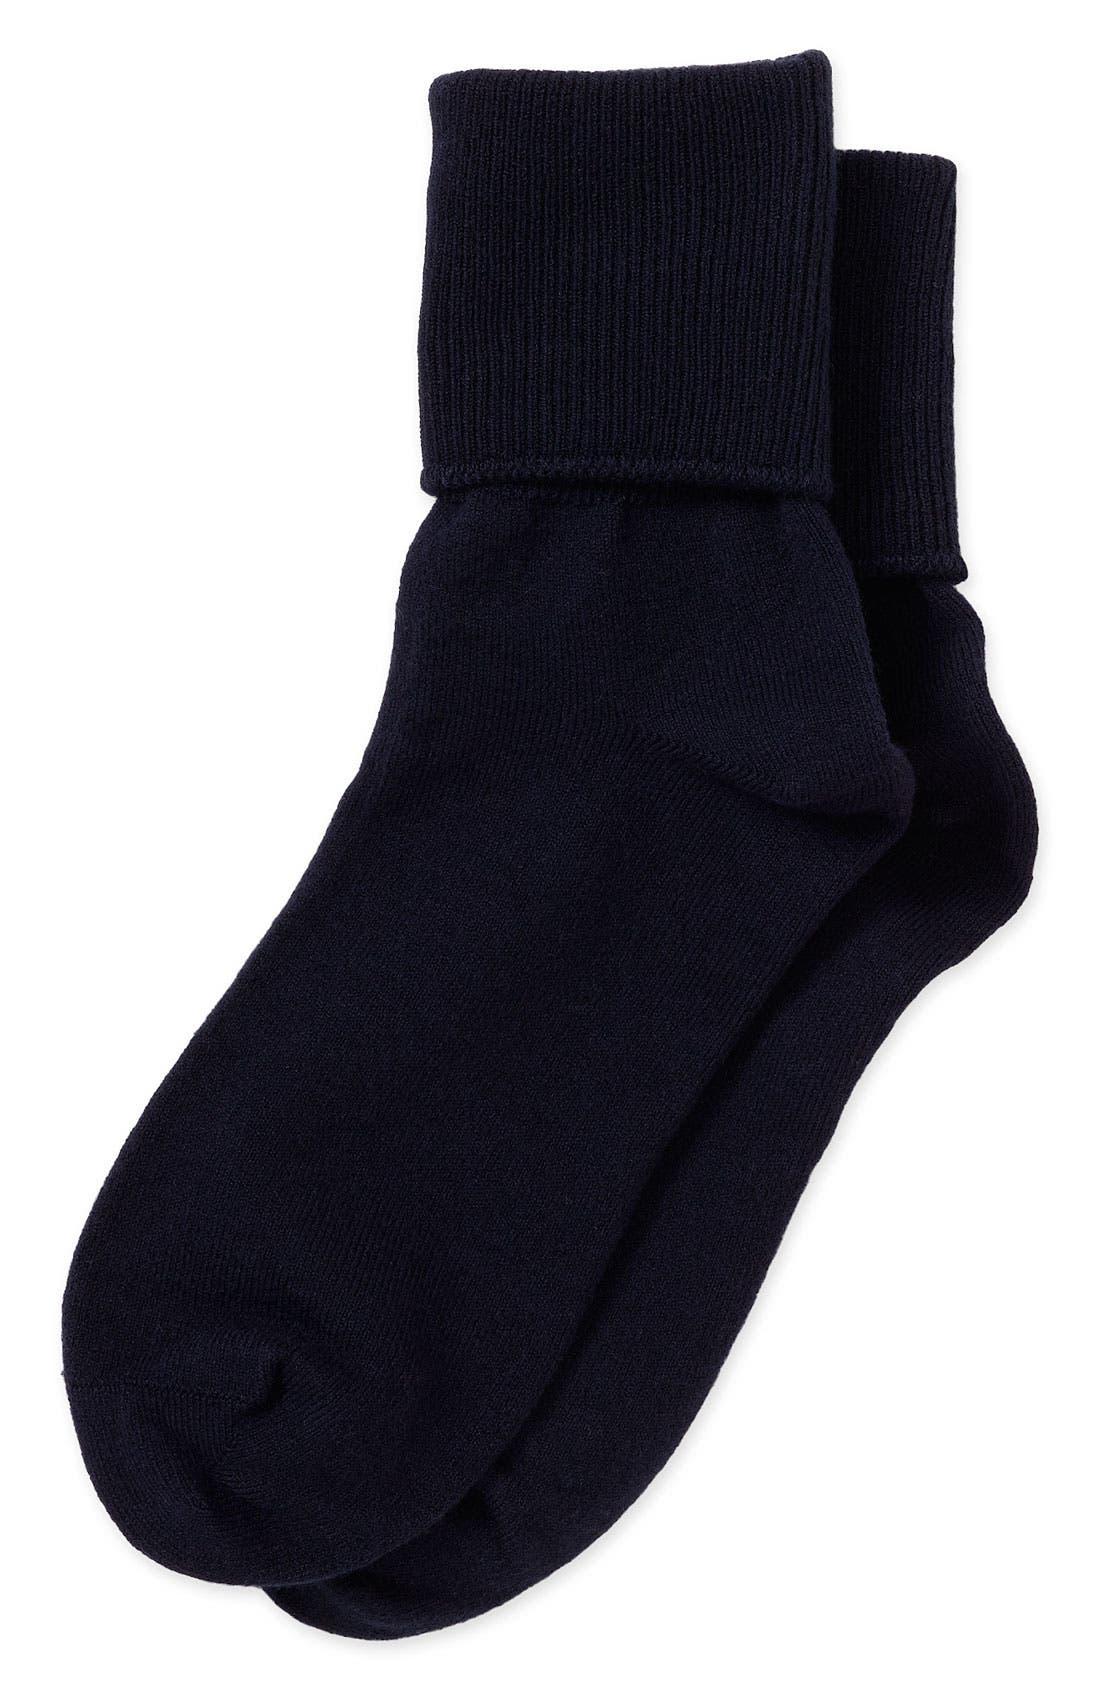 Main Image - Nordstrom Cotton Blend Socks with Turn Cuffs (Baby Girls, Toddler Girls, Little Girls & Big Girls)